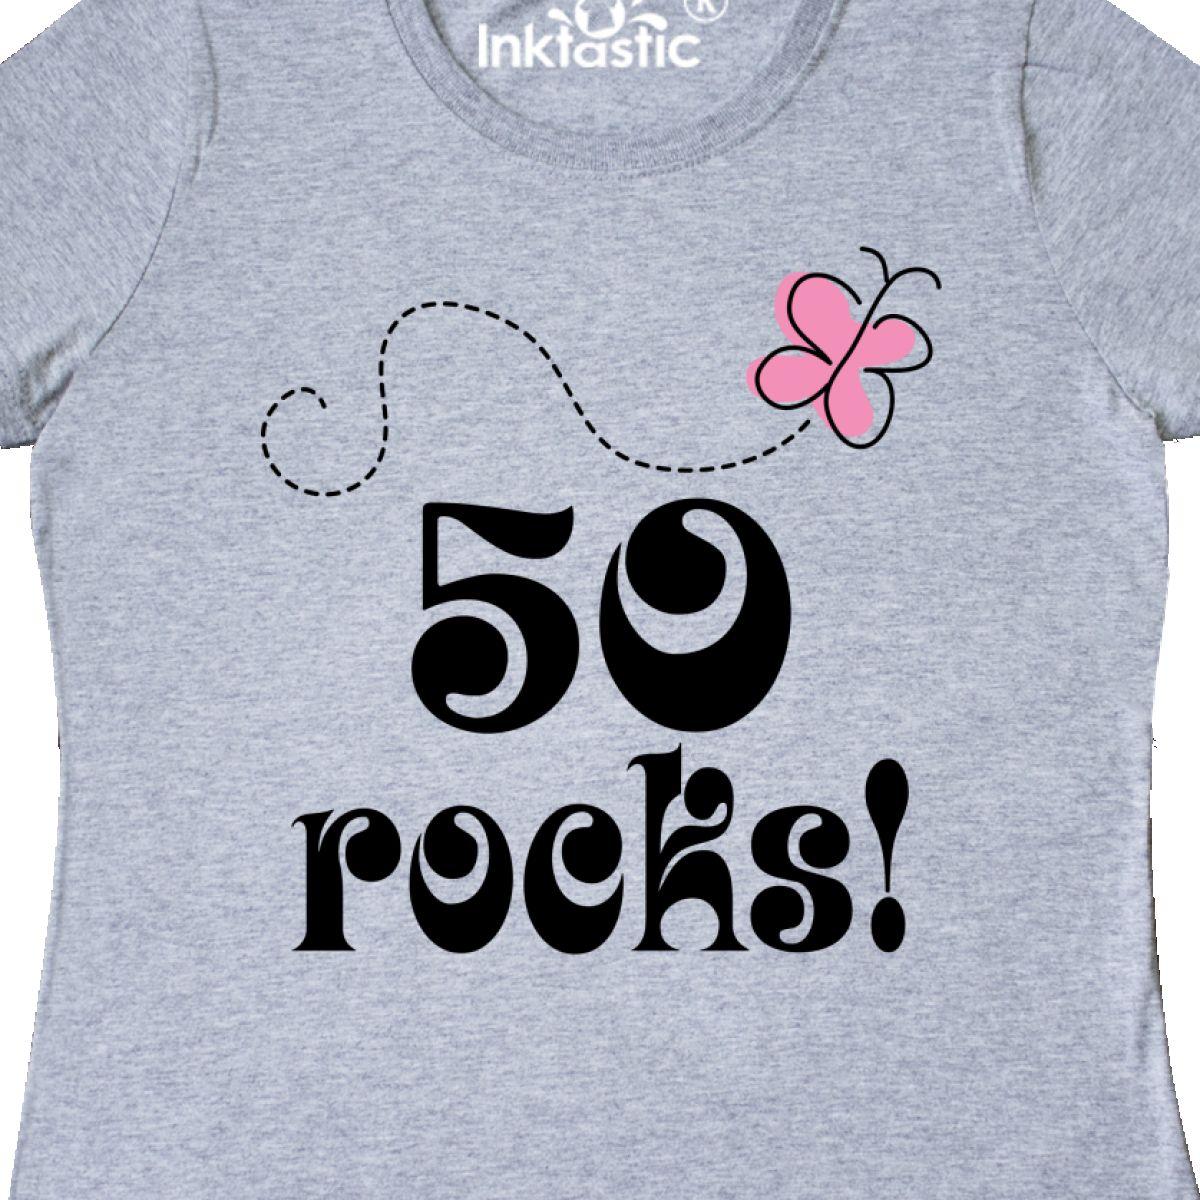 Inktastic 50th Birthday 50 Rocks Gift Women 039